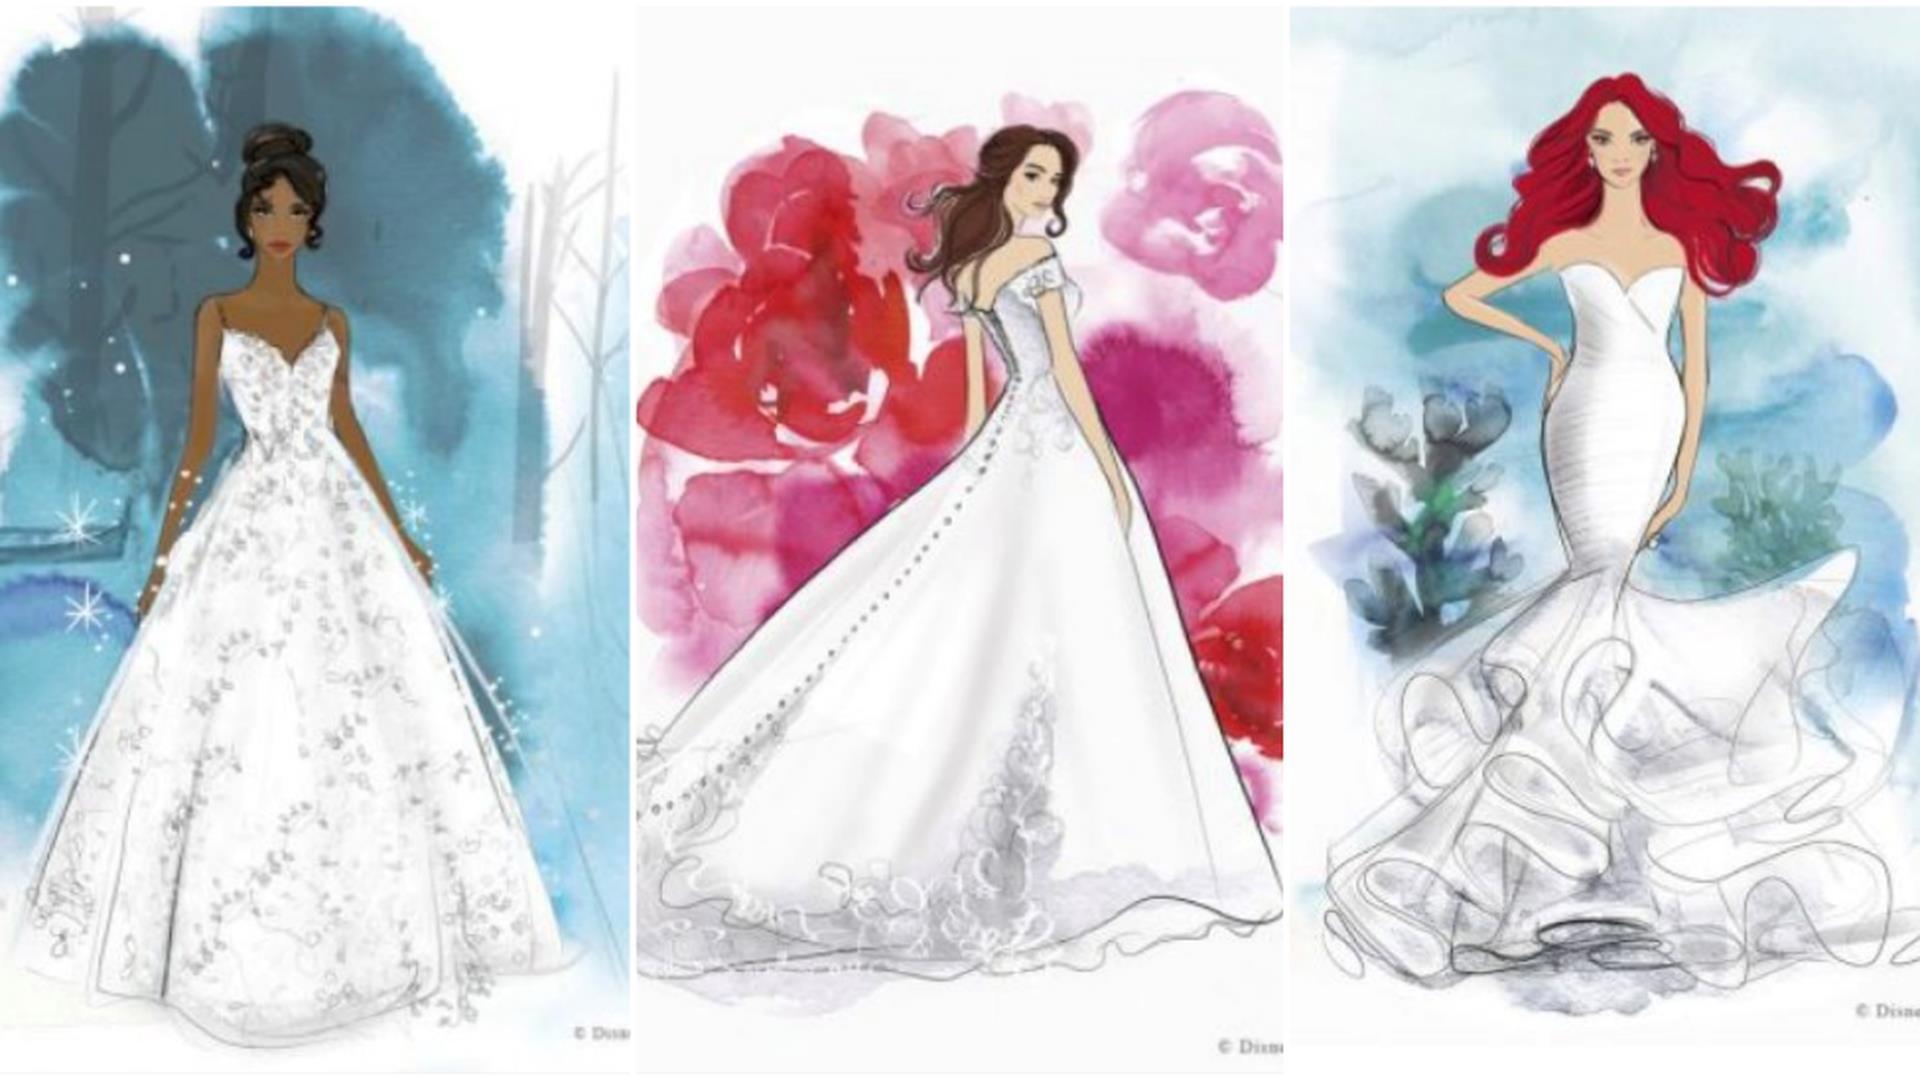 Abiti Da Sposa Walt Disney.Disney Svela I Suoi Vestiti Da Sposa Ispirati Alle Principesse